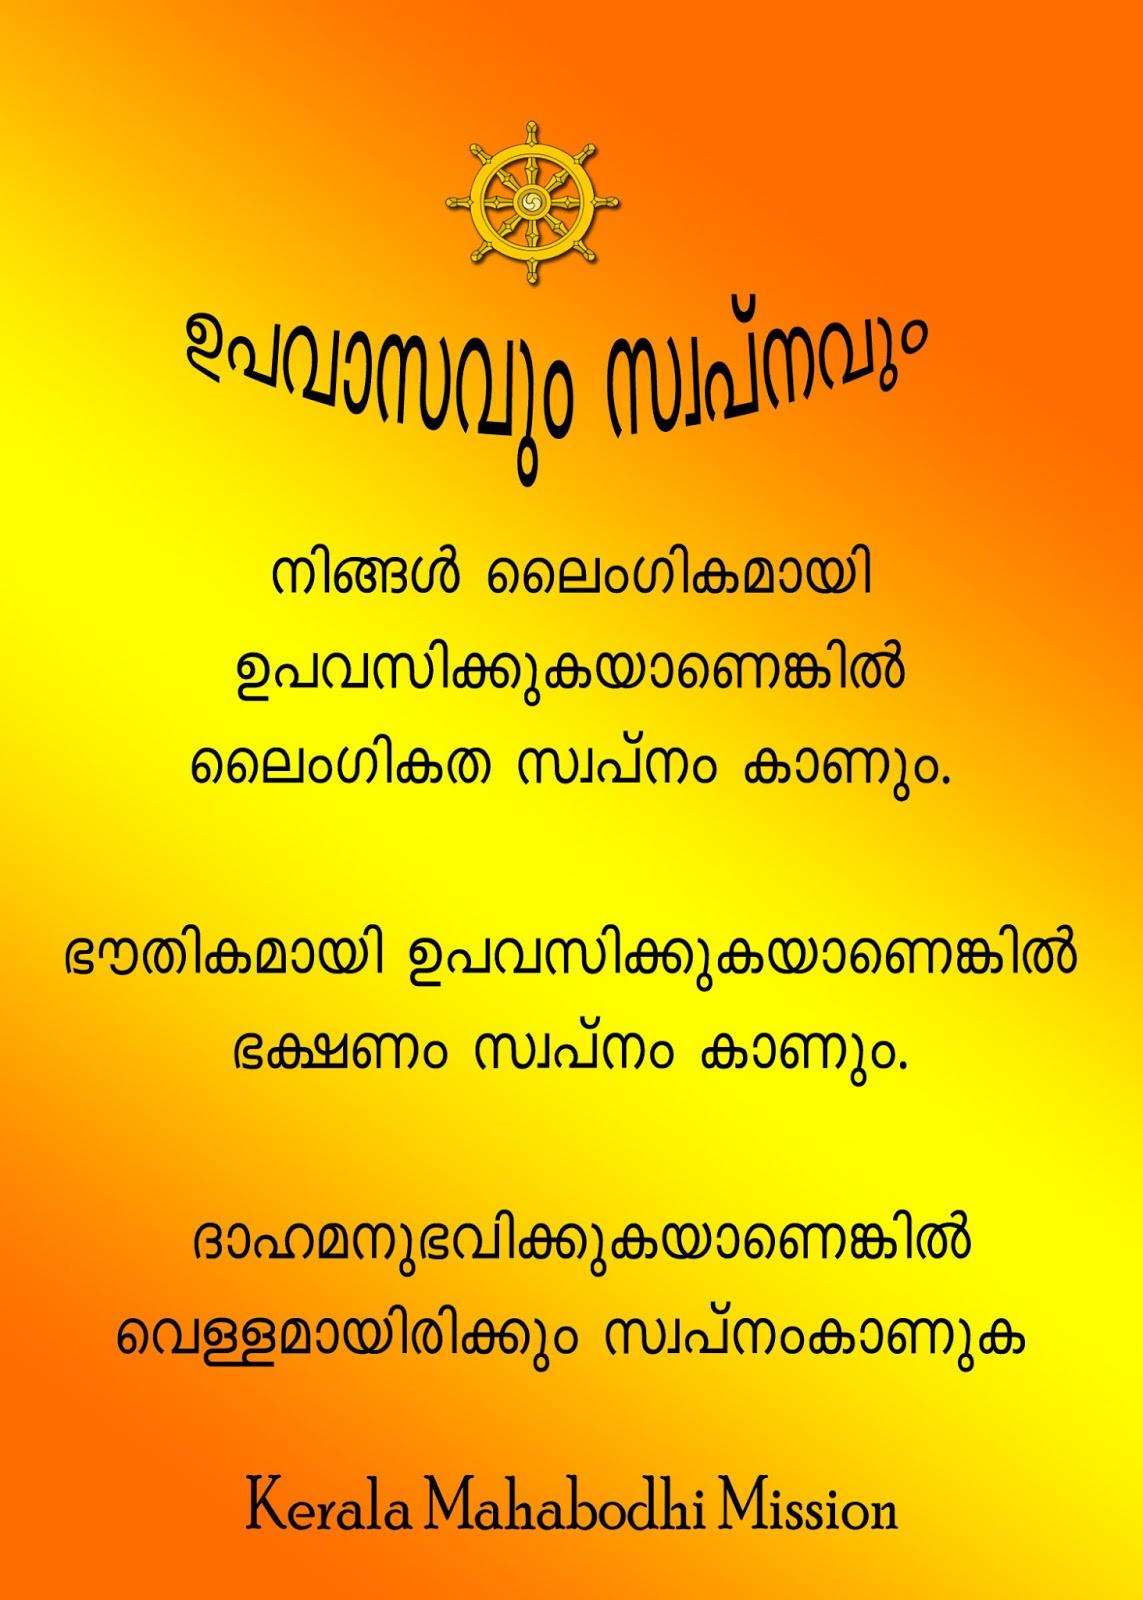 Housewarming Wishes In Malayalam Best Custom Invitation Template